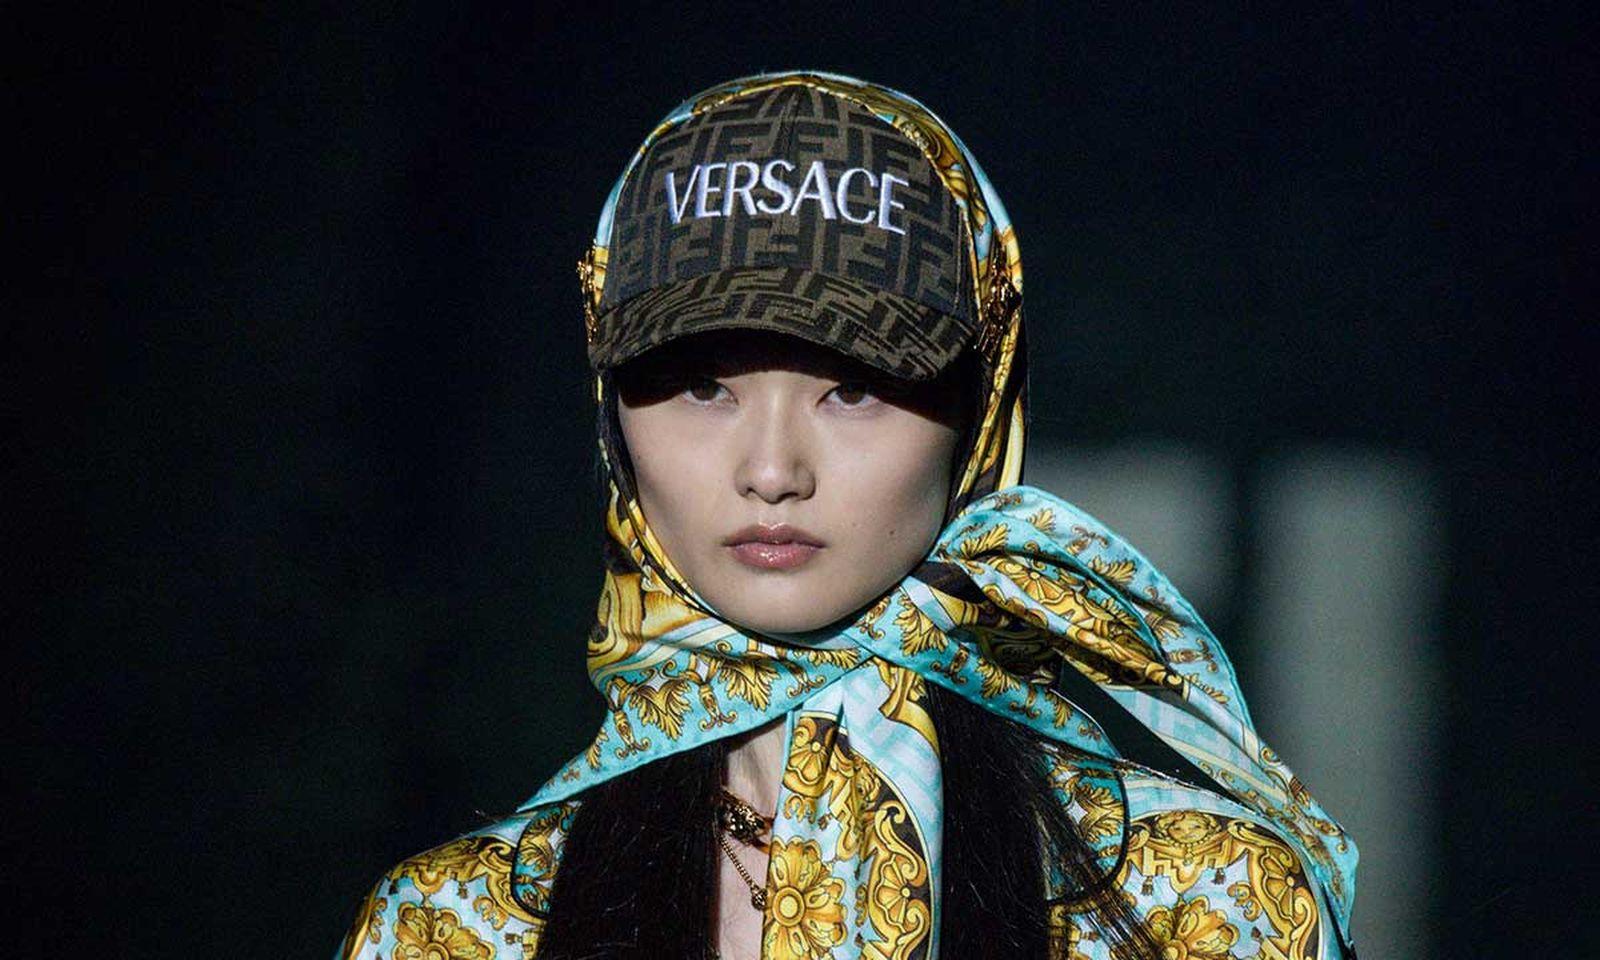 versace-fendi-collab- 0